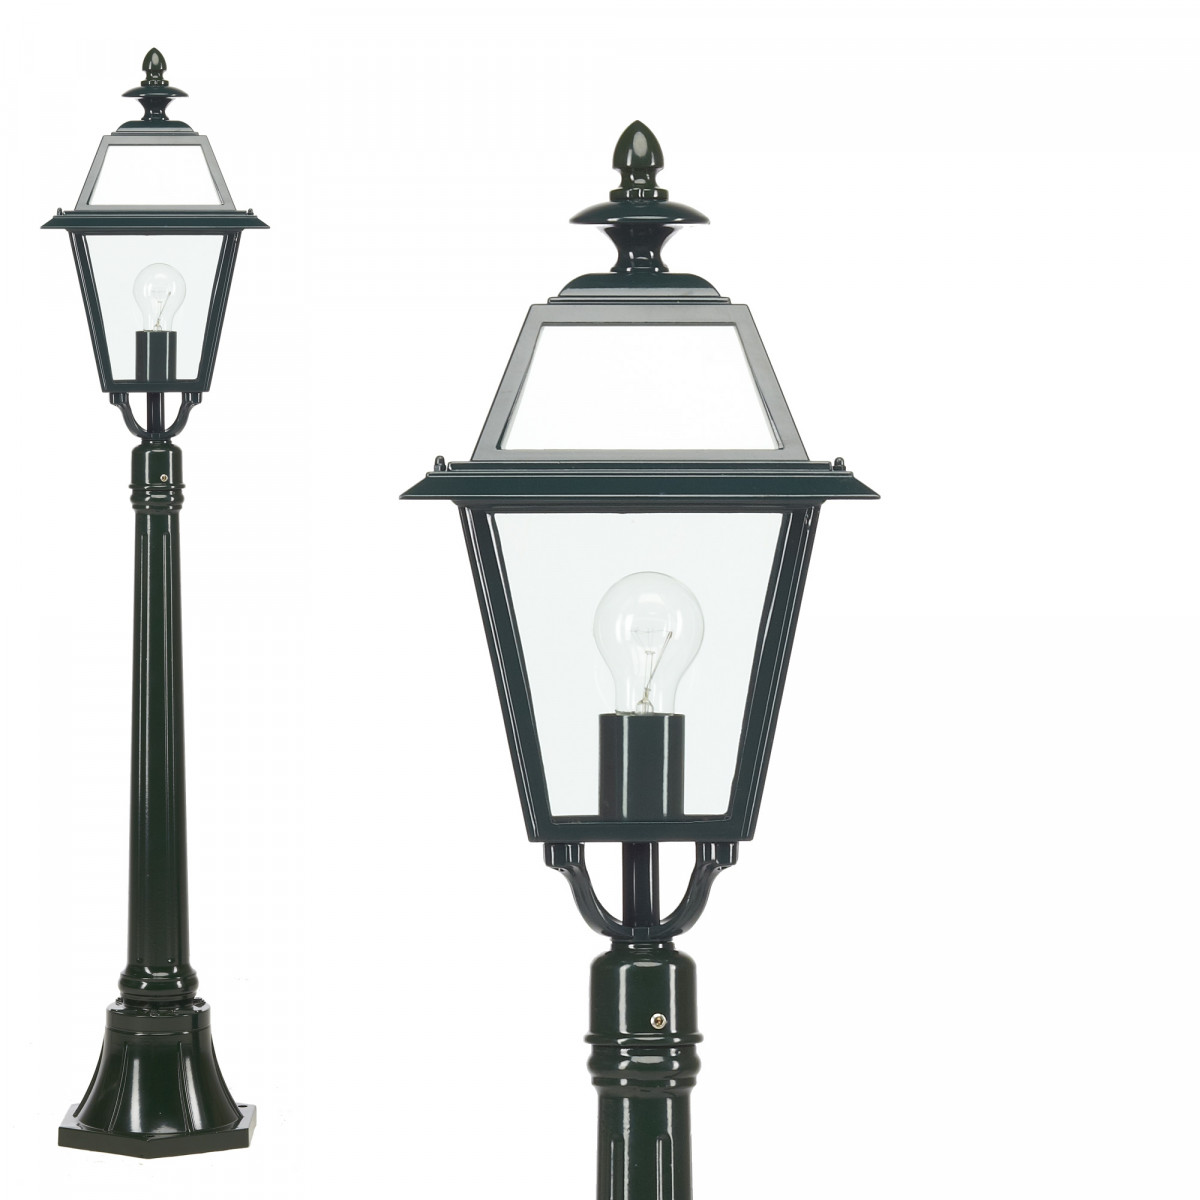 Tuinlamp Elkenrade